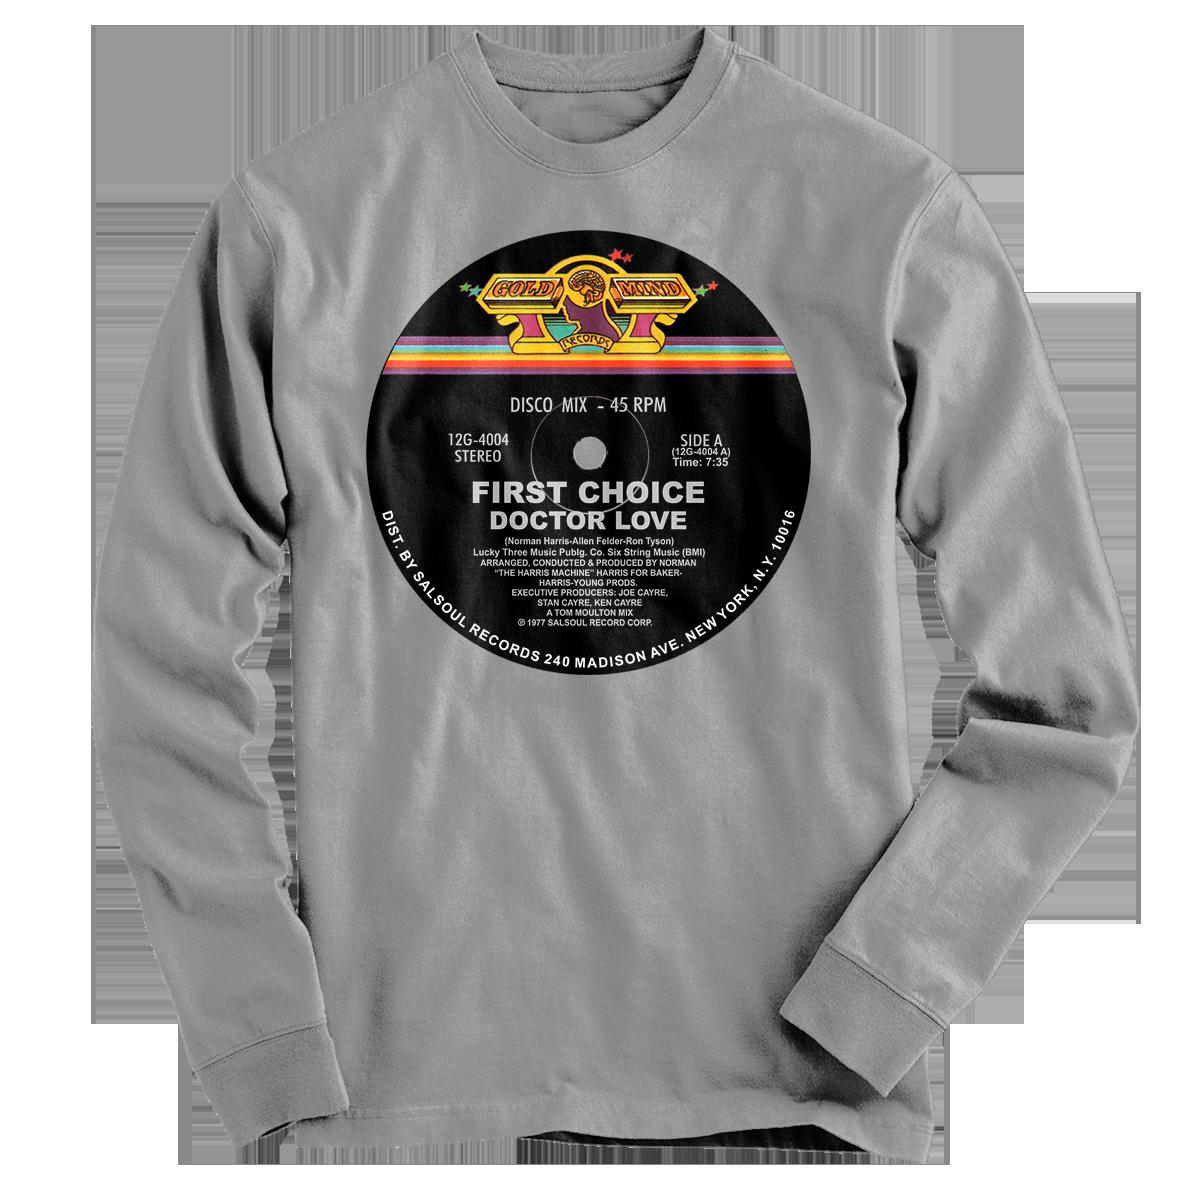 Musician Shirts - First Choice-Doctor Love Shirt   Throwbacks